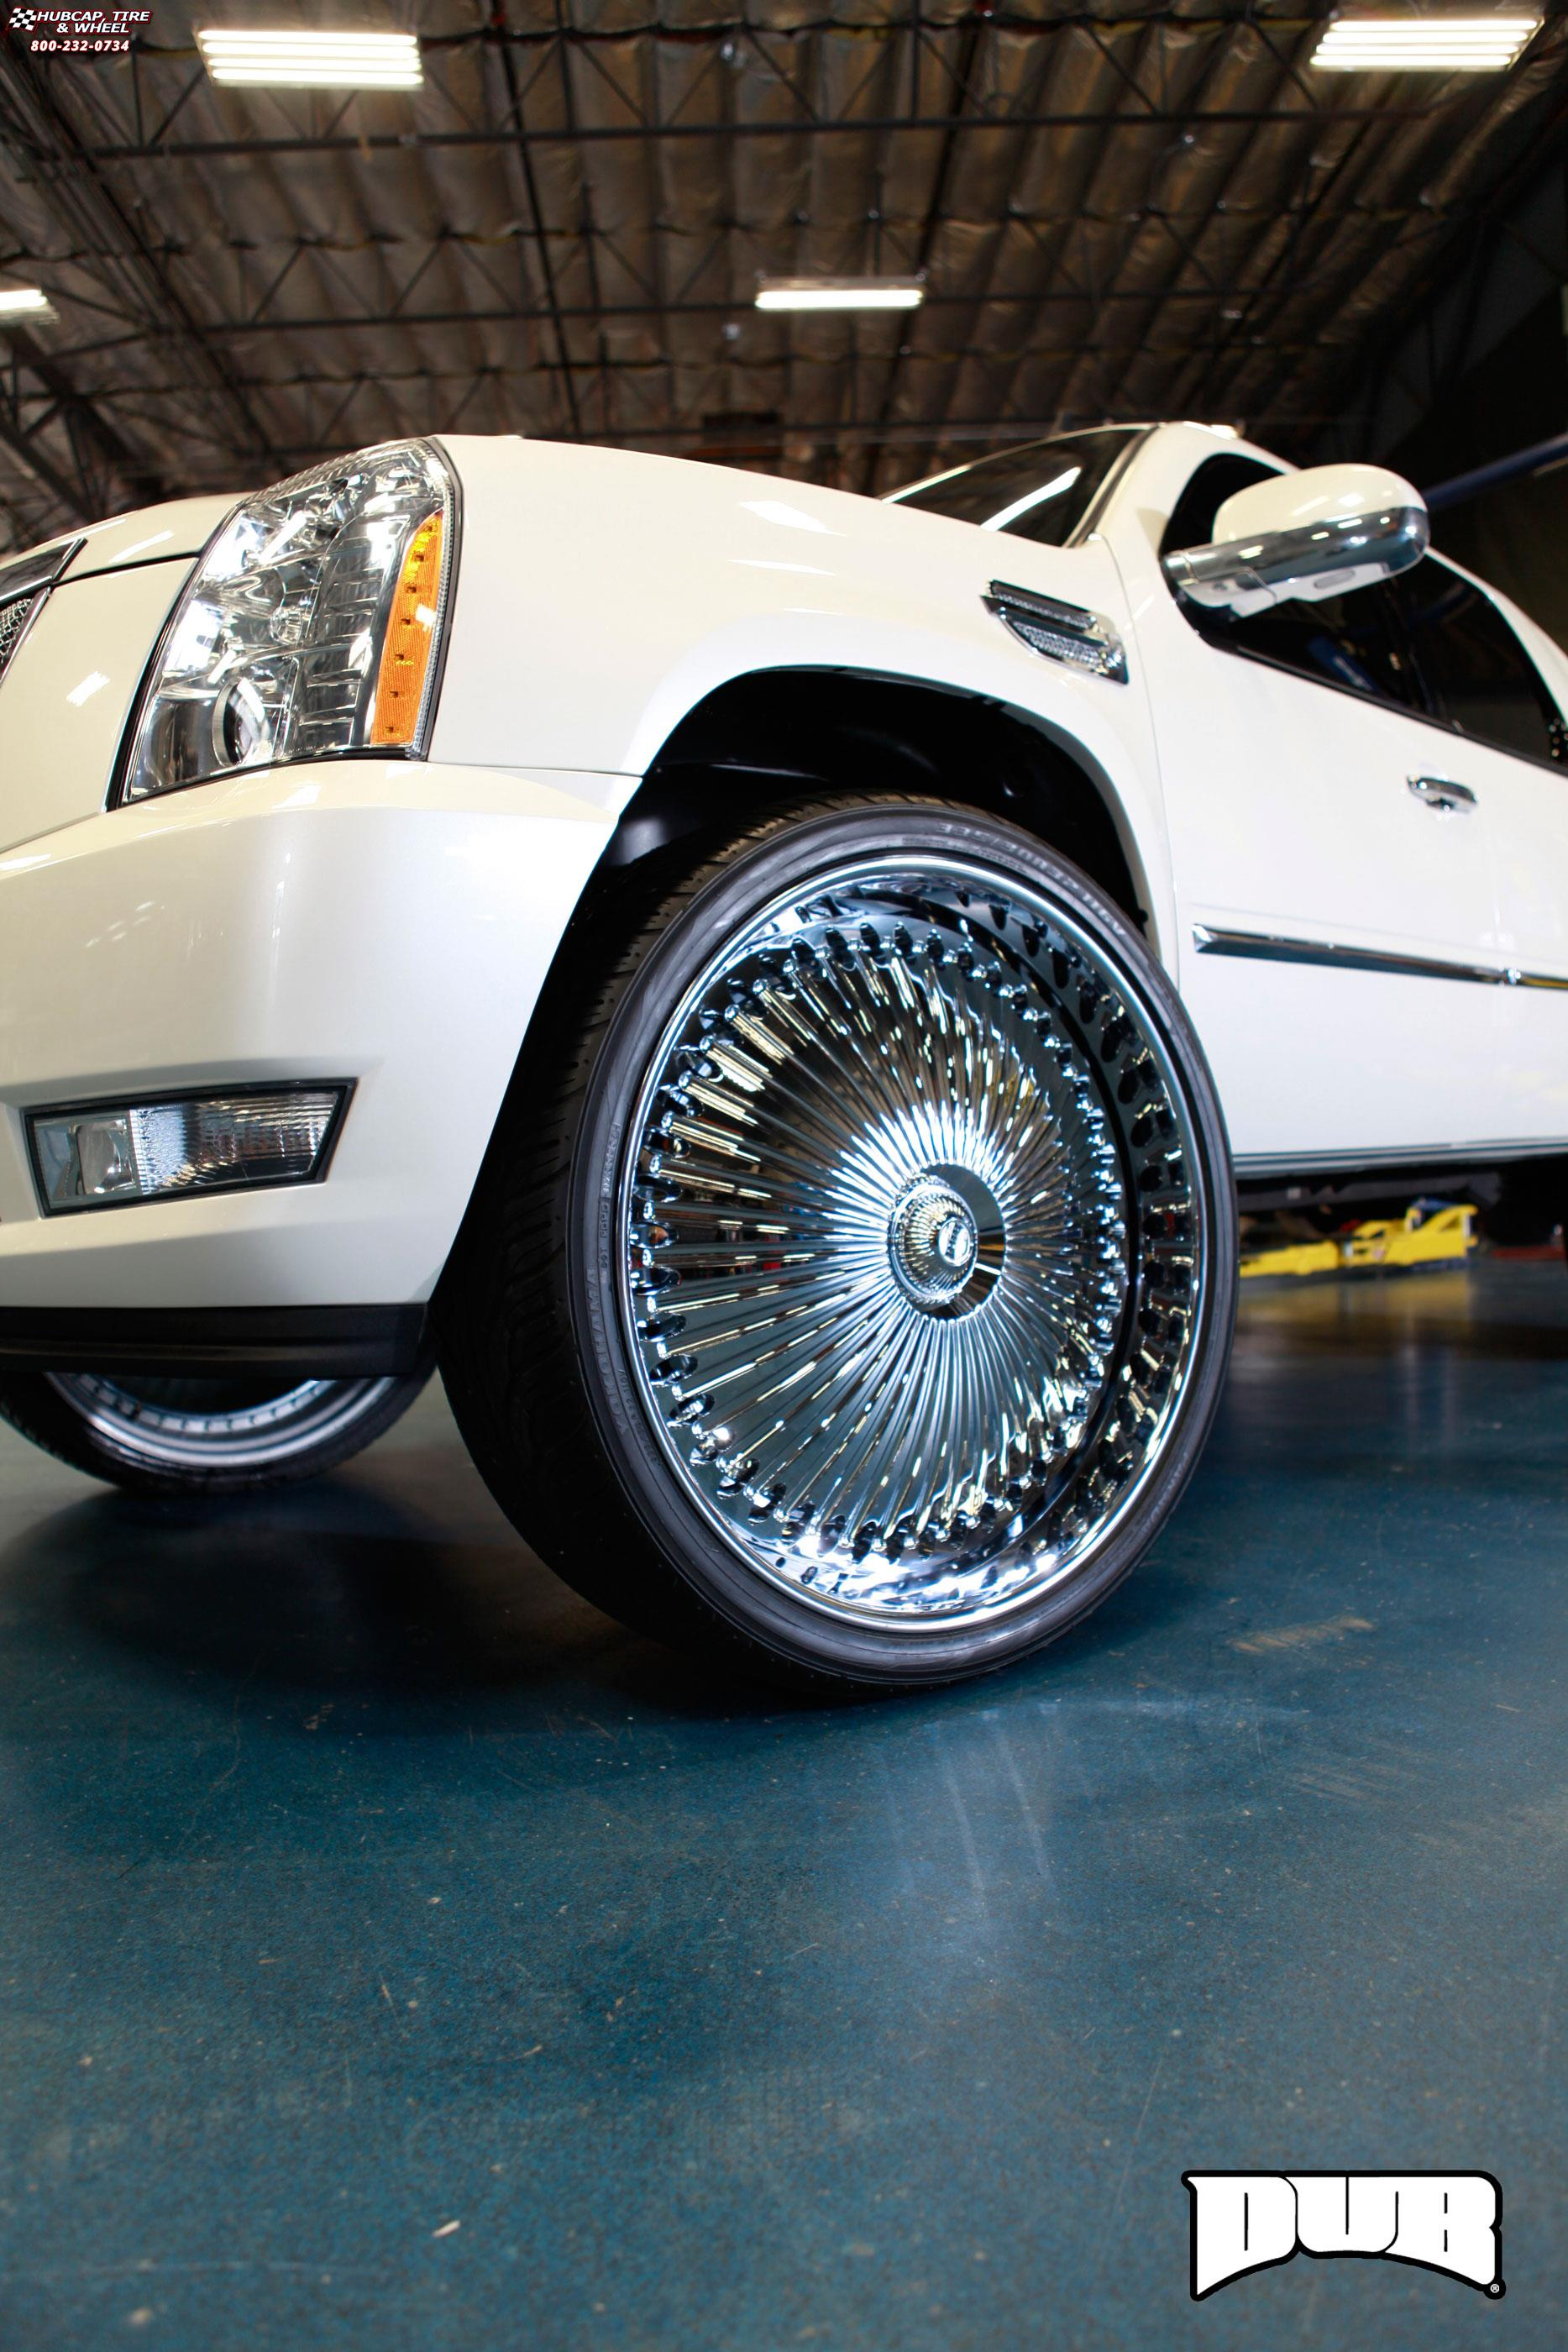 Cadillac Escalade Dub S777 - Bellagio Wheels Chrome